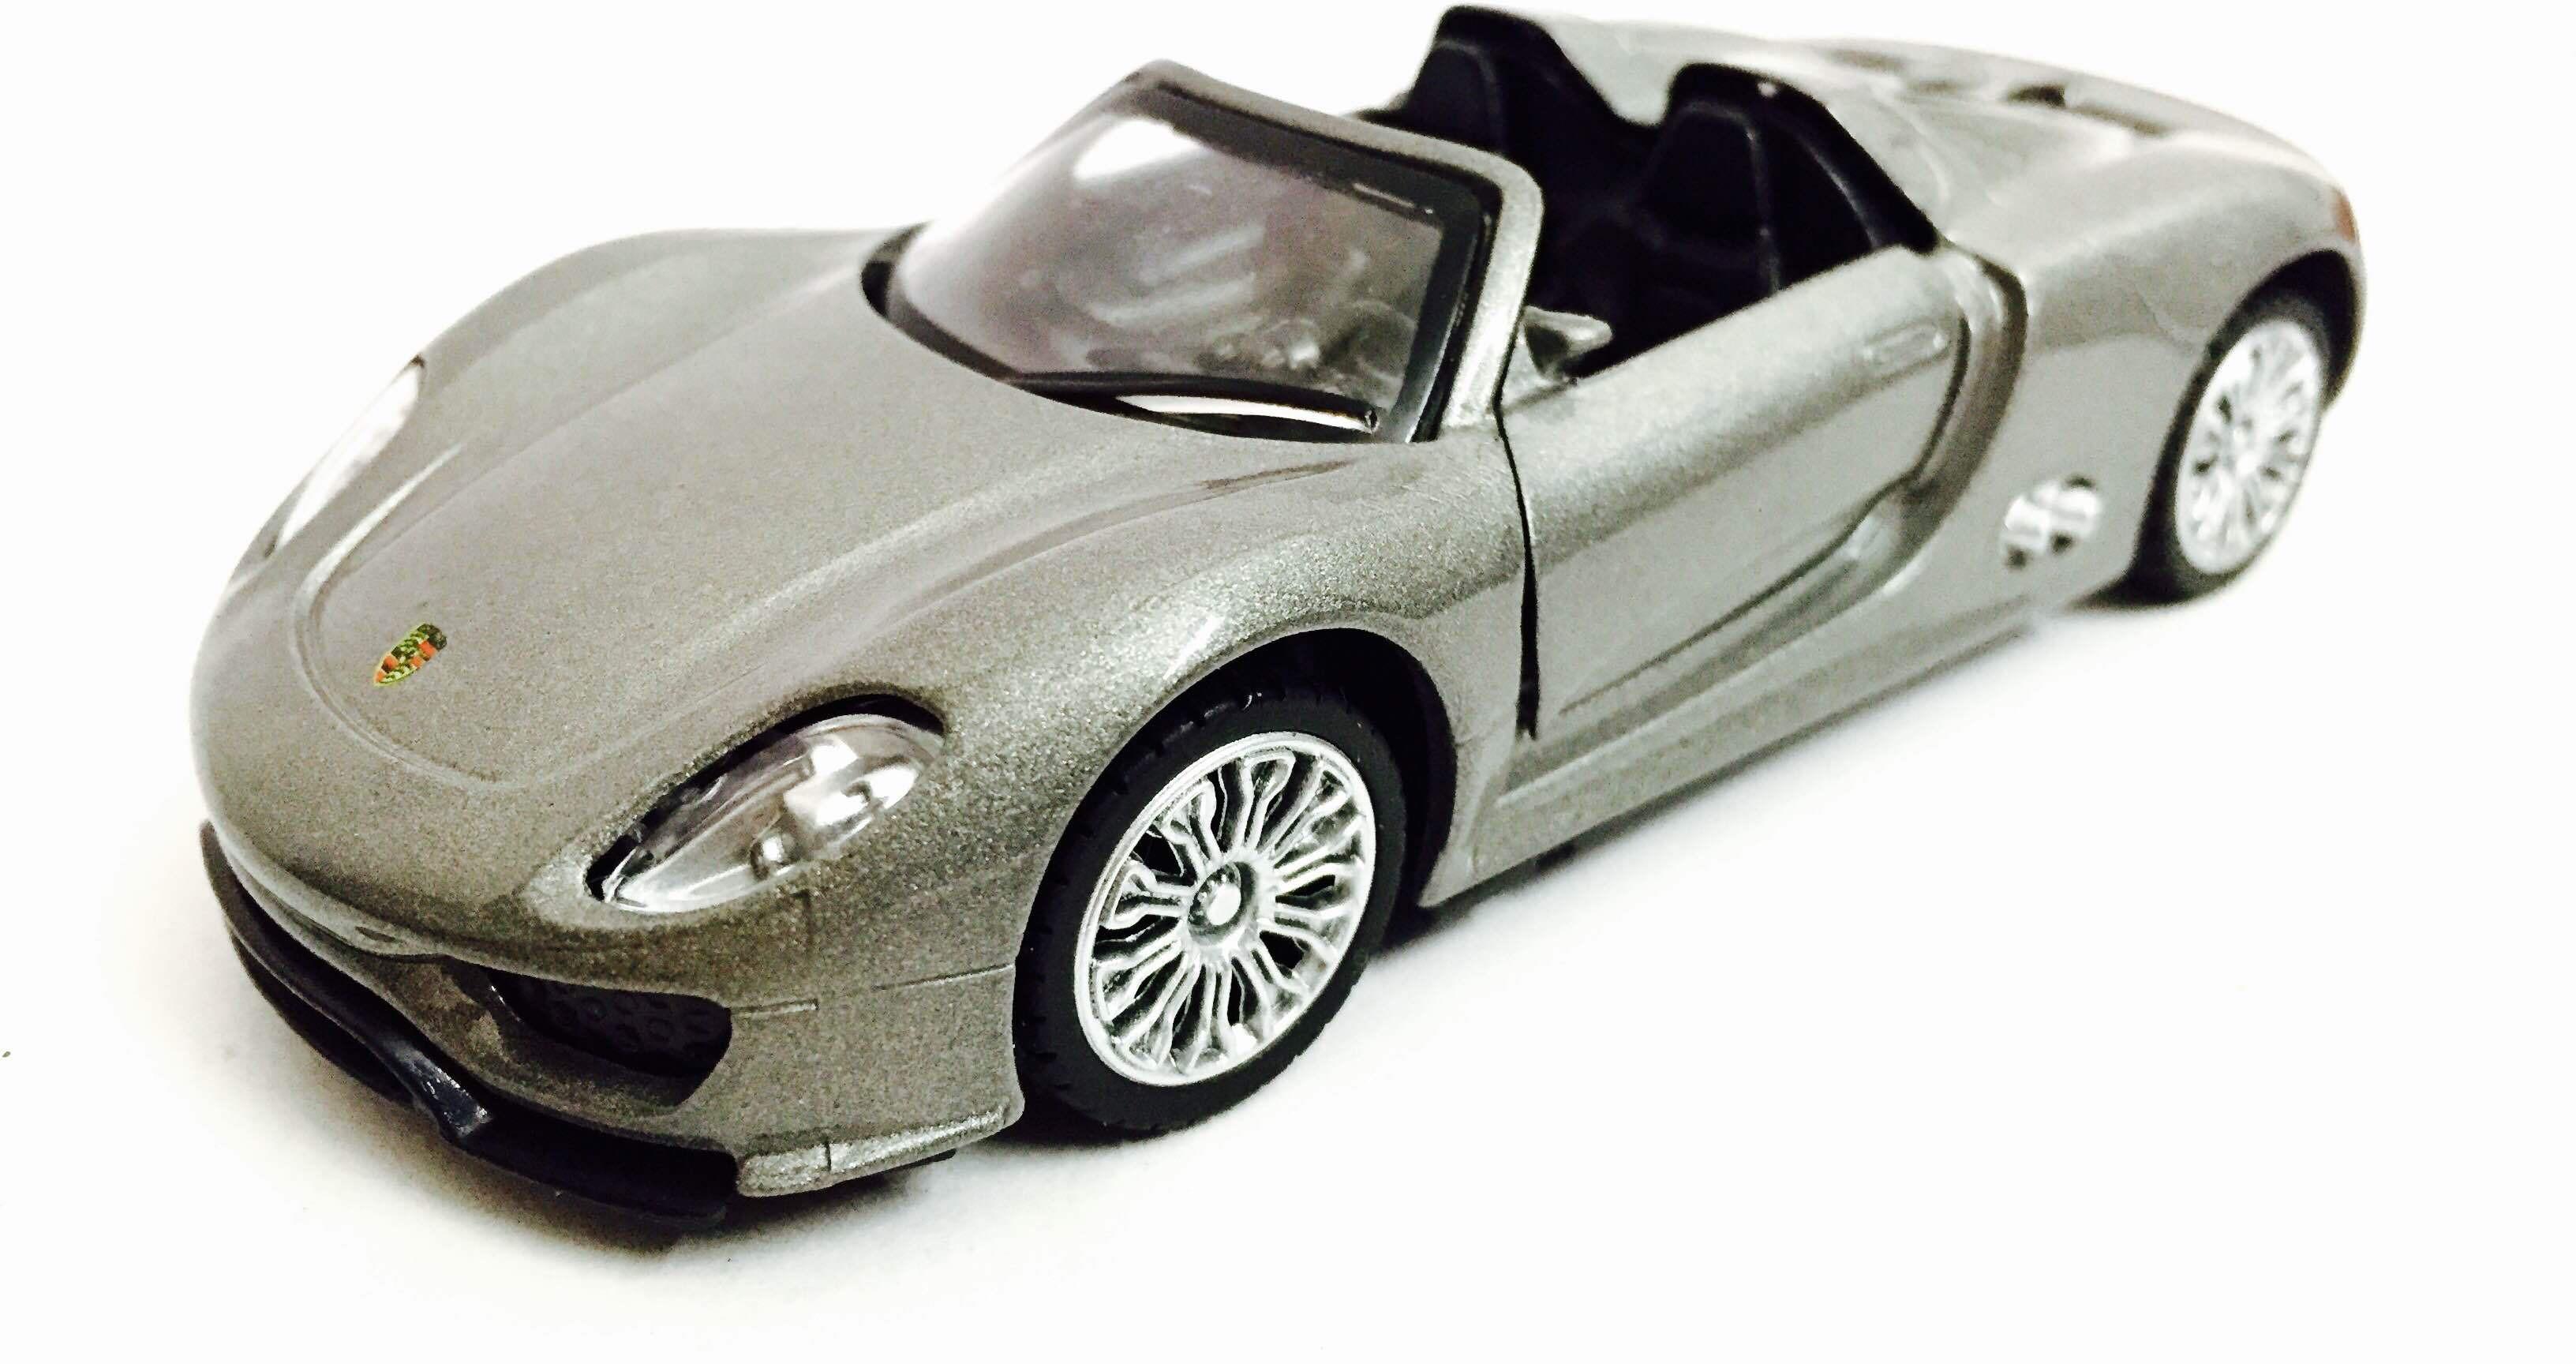 innovador-porsche-918-spyder-1-38-original-imaejfwehz9k3qbk Fascinating Porsche 918 Spyder Fiyat Listesi Cars Trend